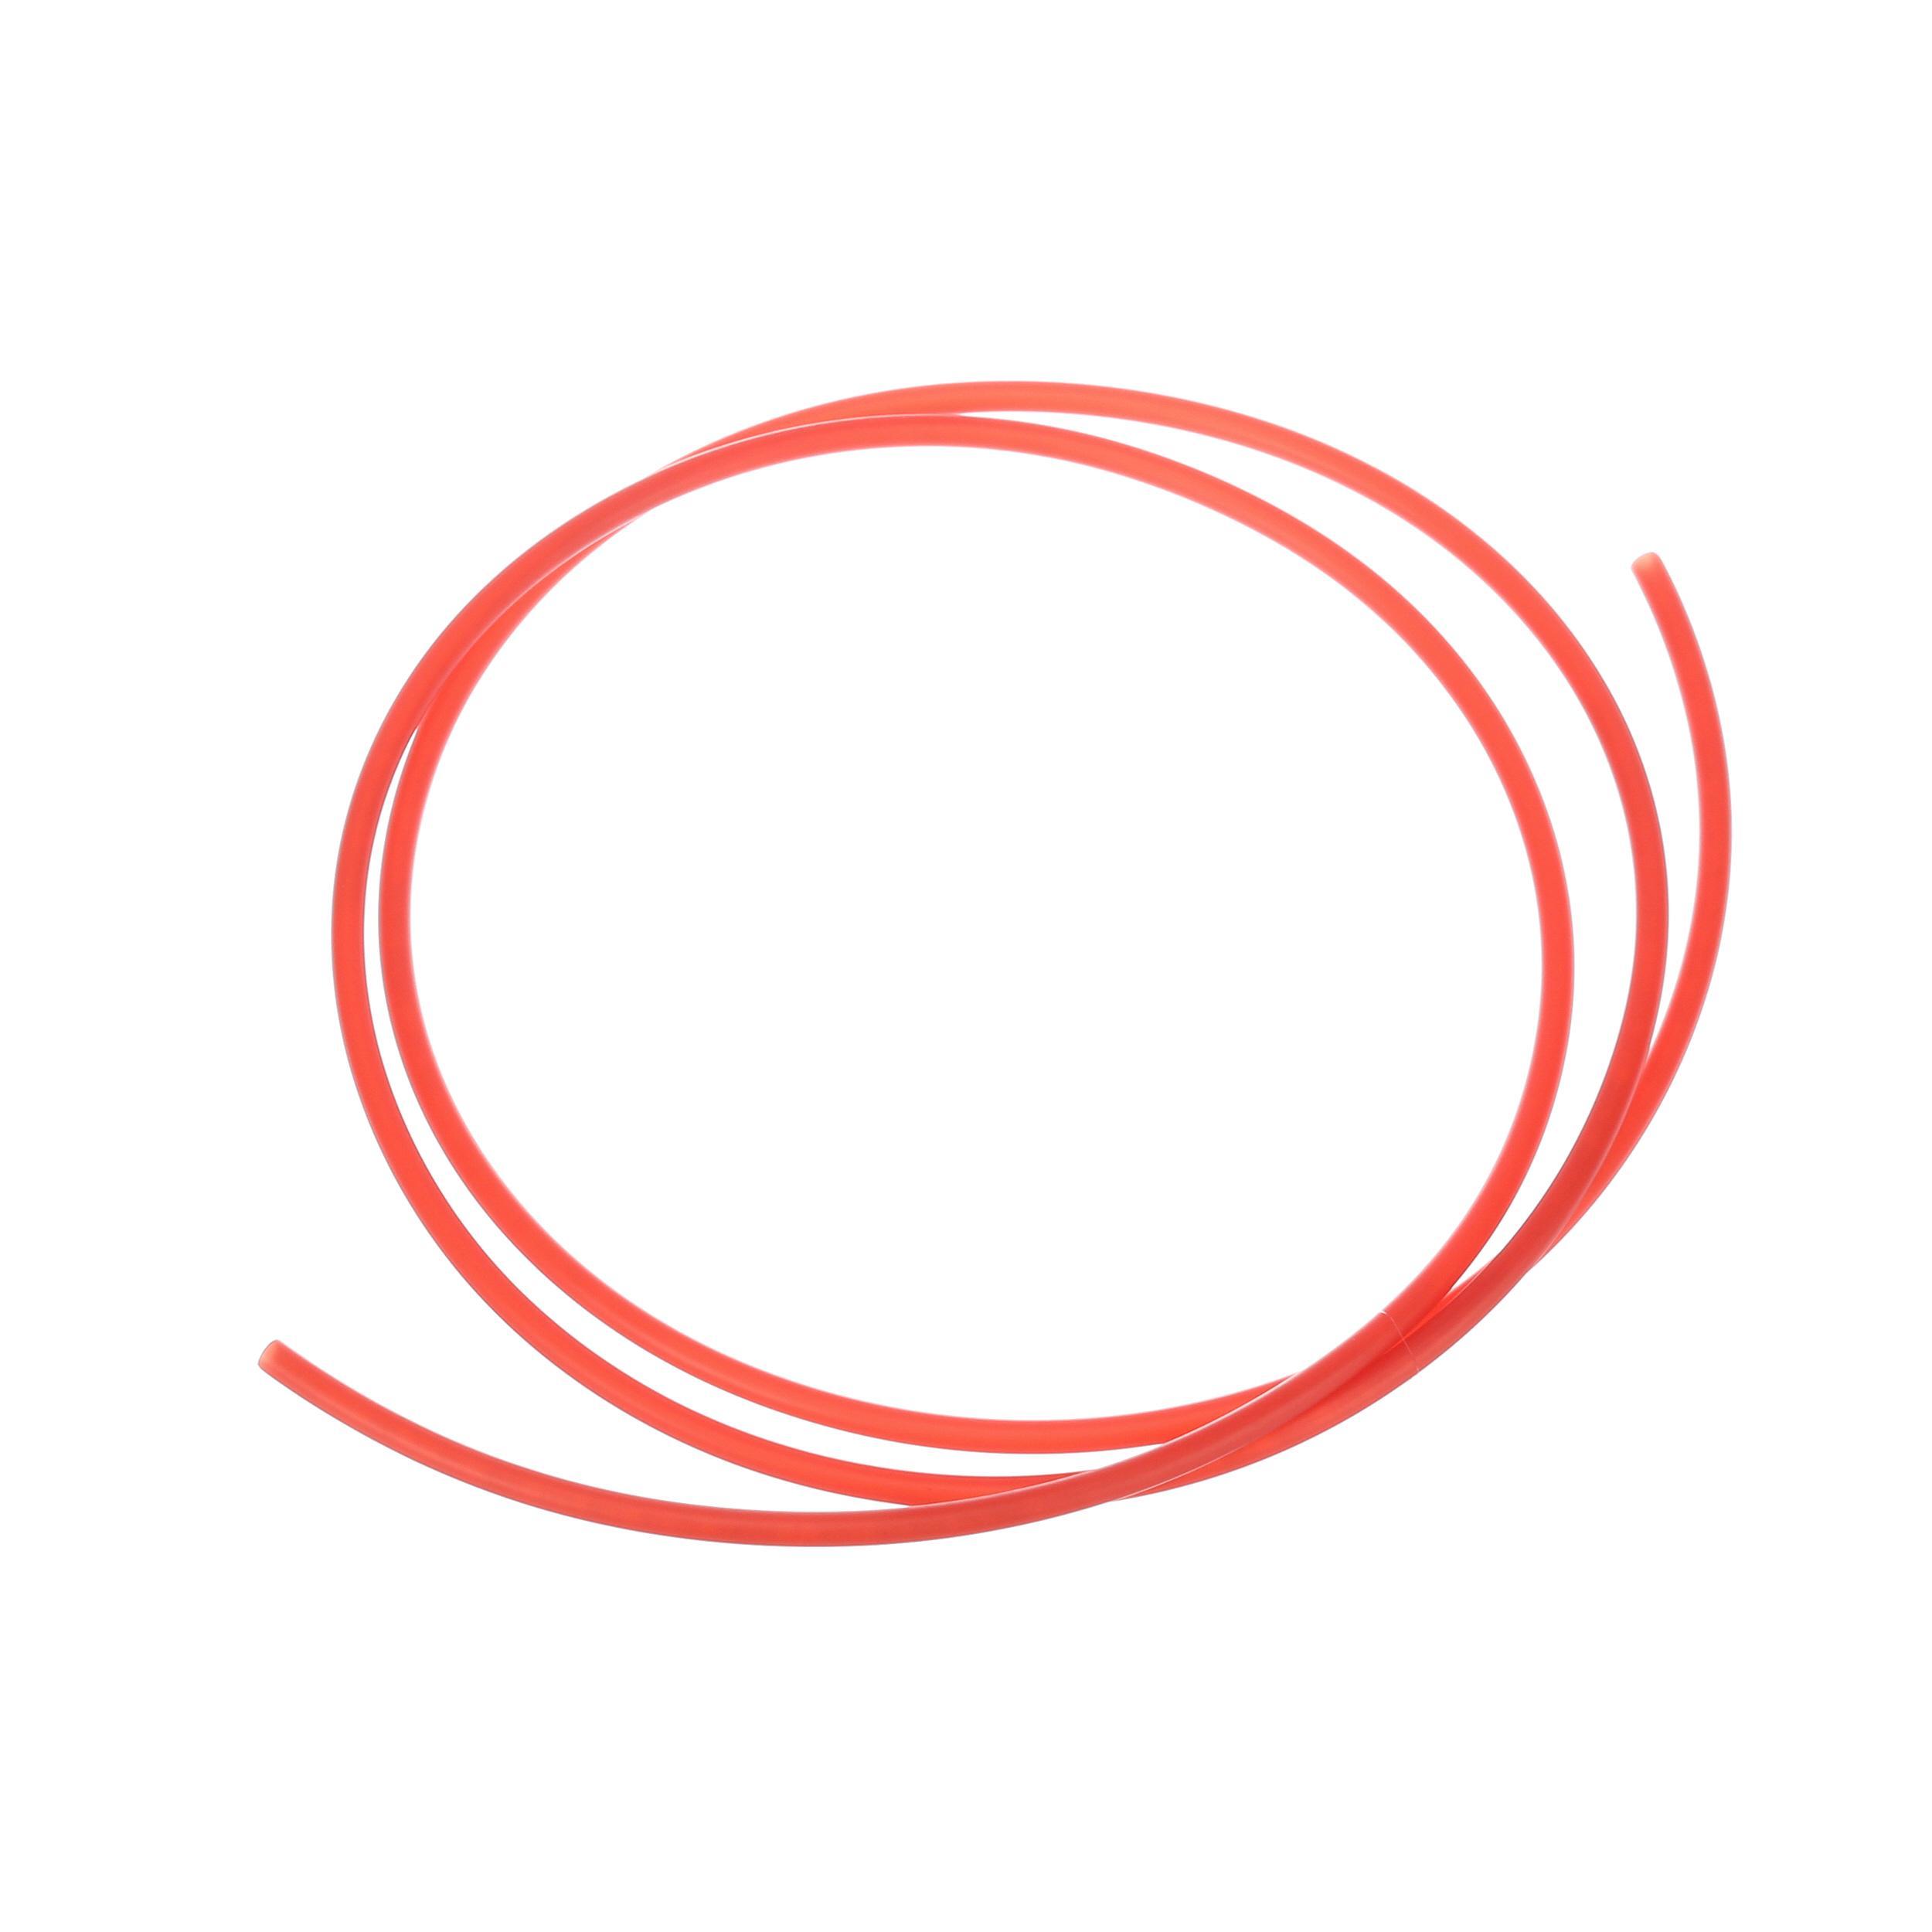 Simply red tube no mato apologise